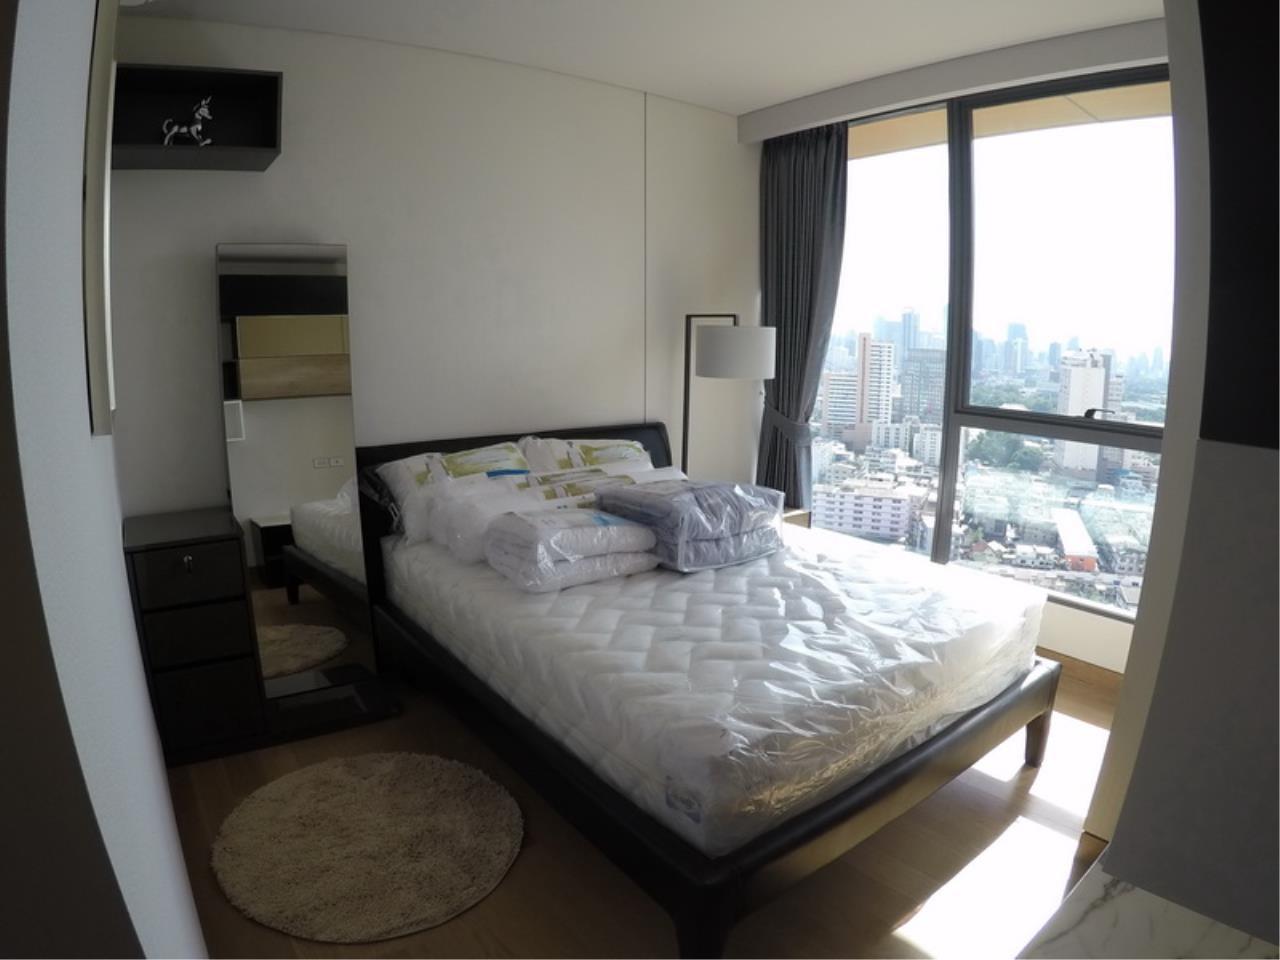 A10180722 Condo for rent at The Lumpini 24